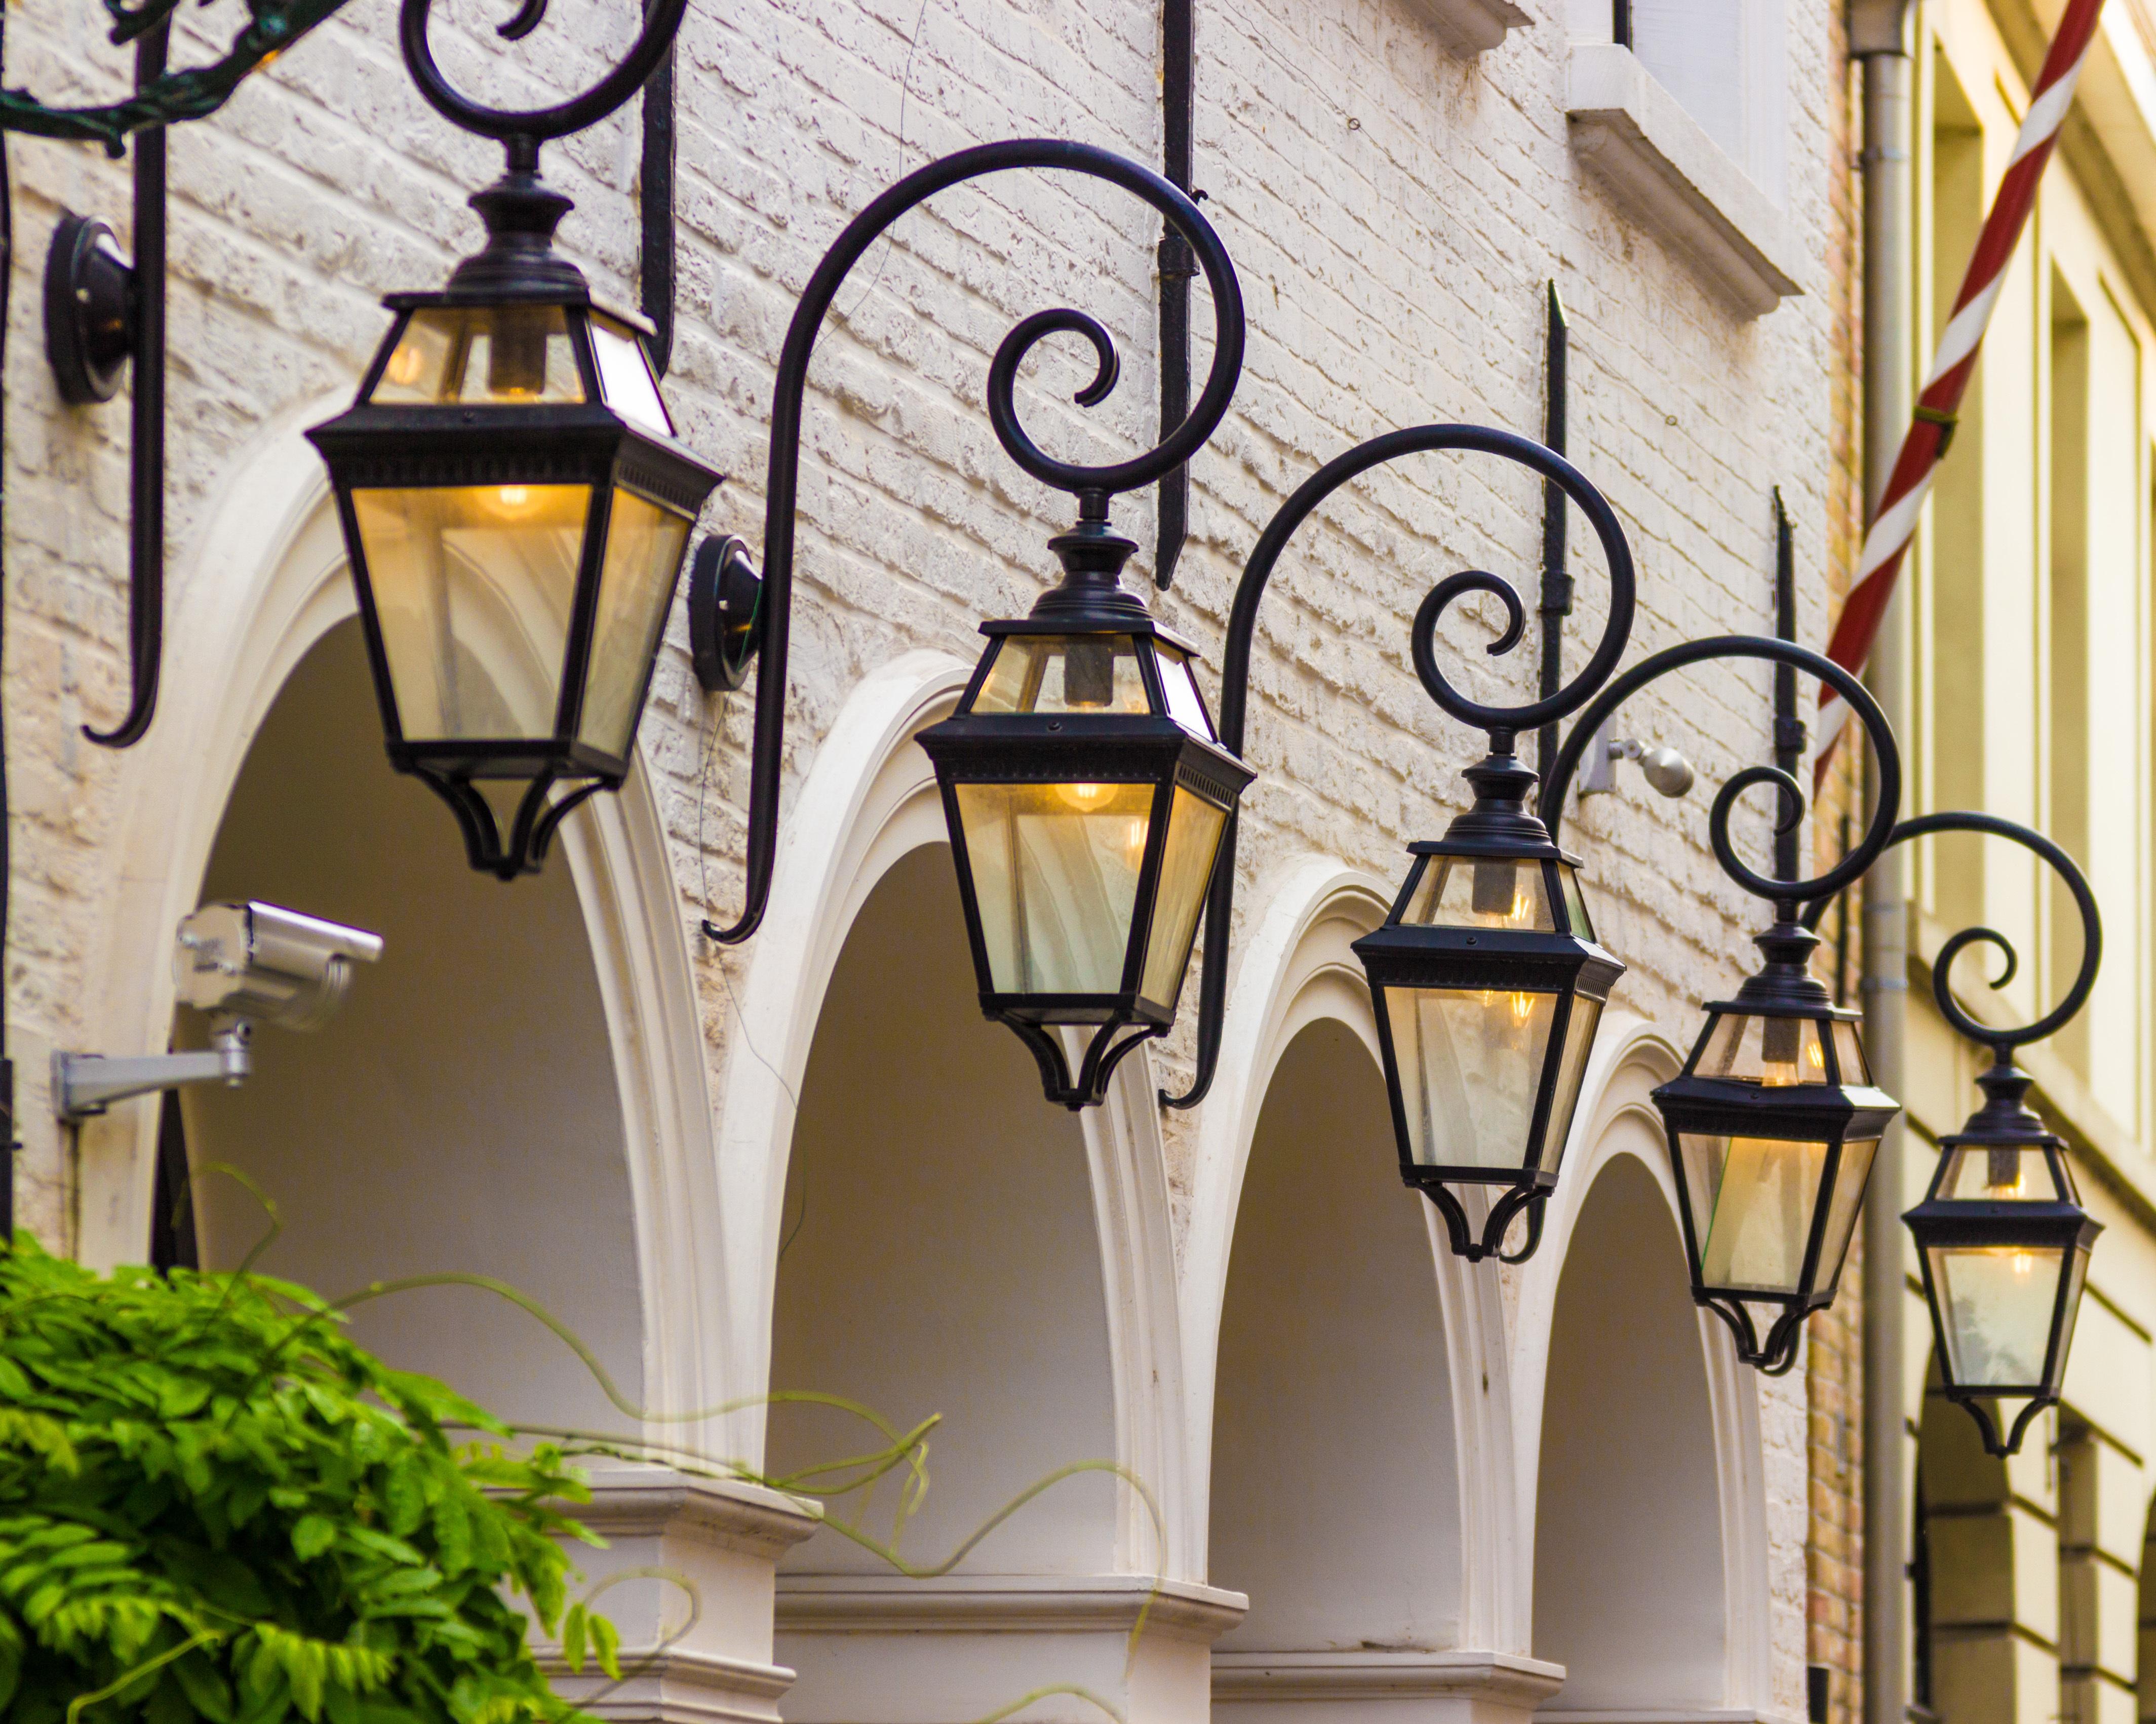 interior lantern lighting. Outdoor Light Window Glass Lantern Romantic Nostalgia Lighting Street Lamp Interior Design Lamps Fixture Iron